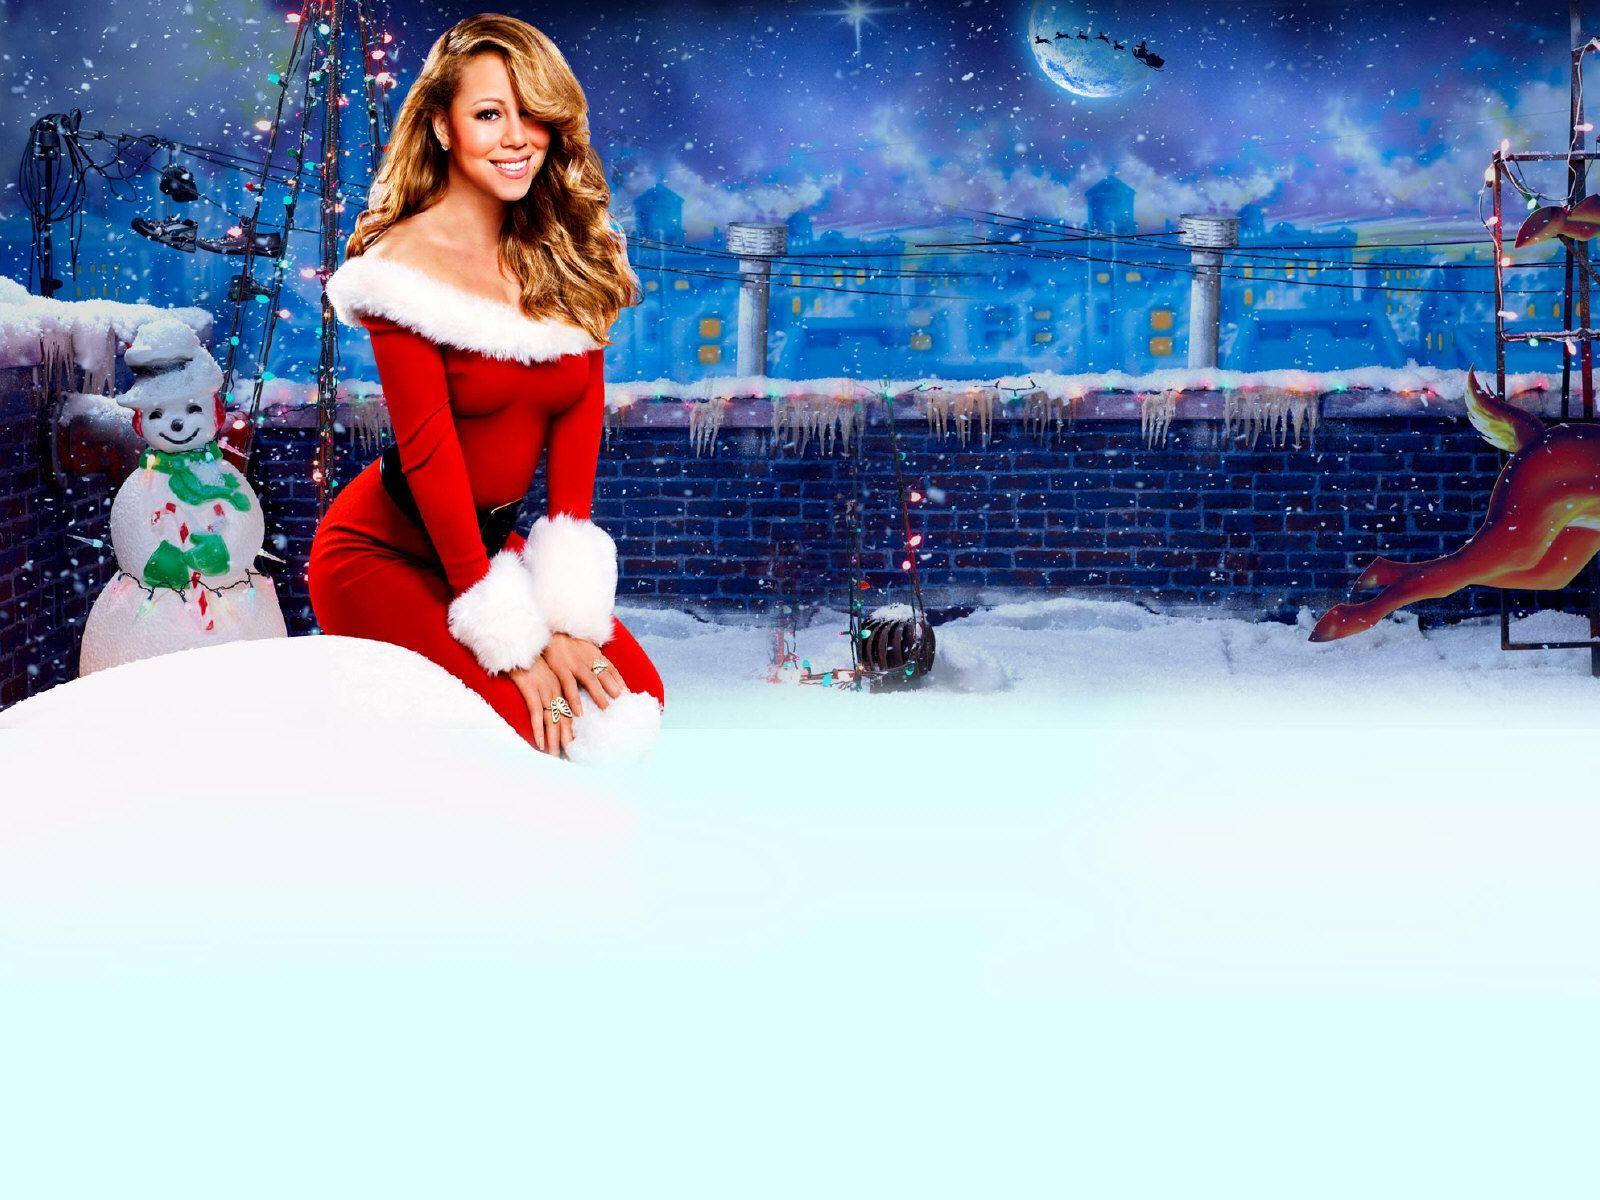 Mariah Carey Christmas.Mariah Carey Christmas Wallpapers Top Free Mariah Carey